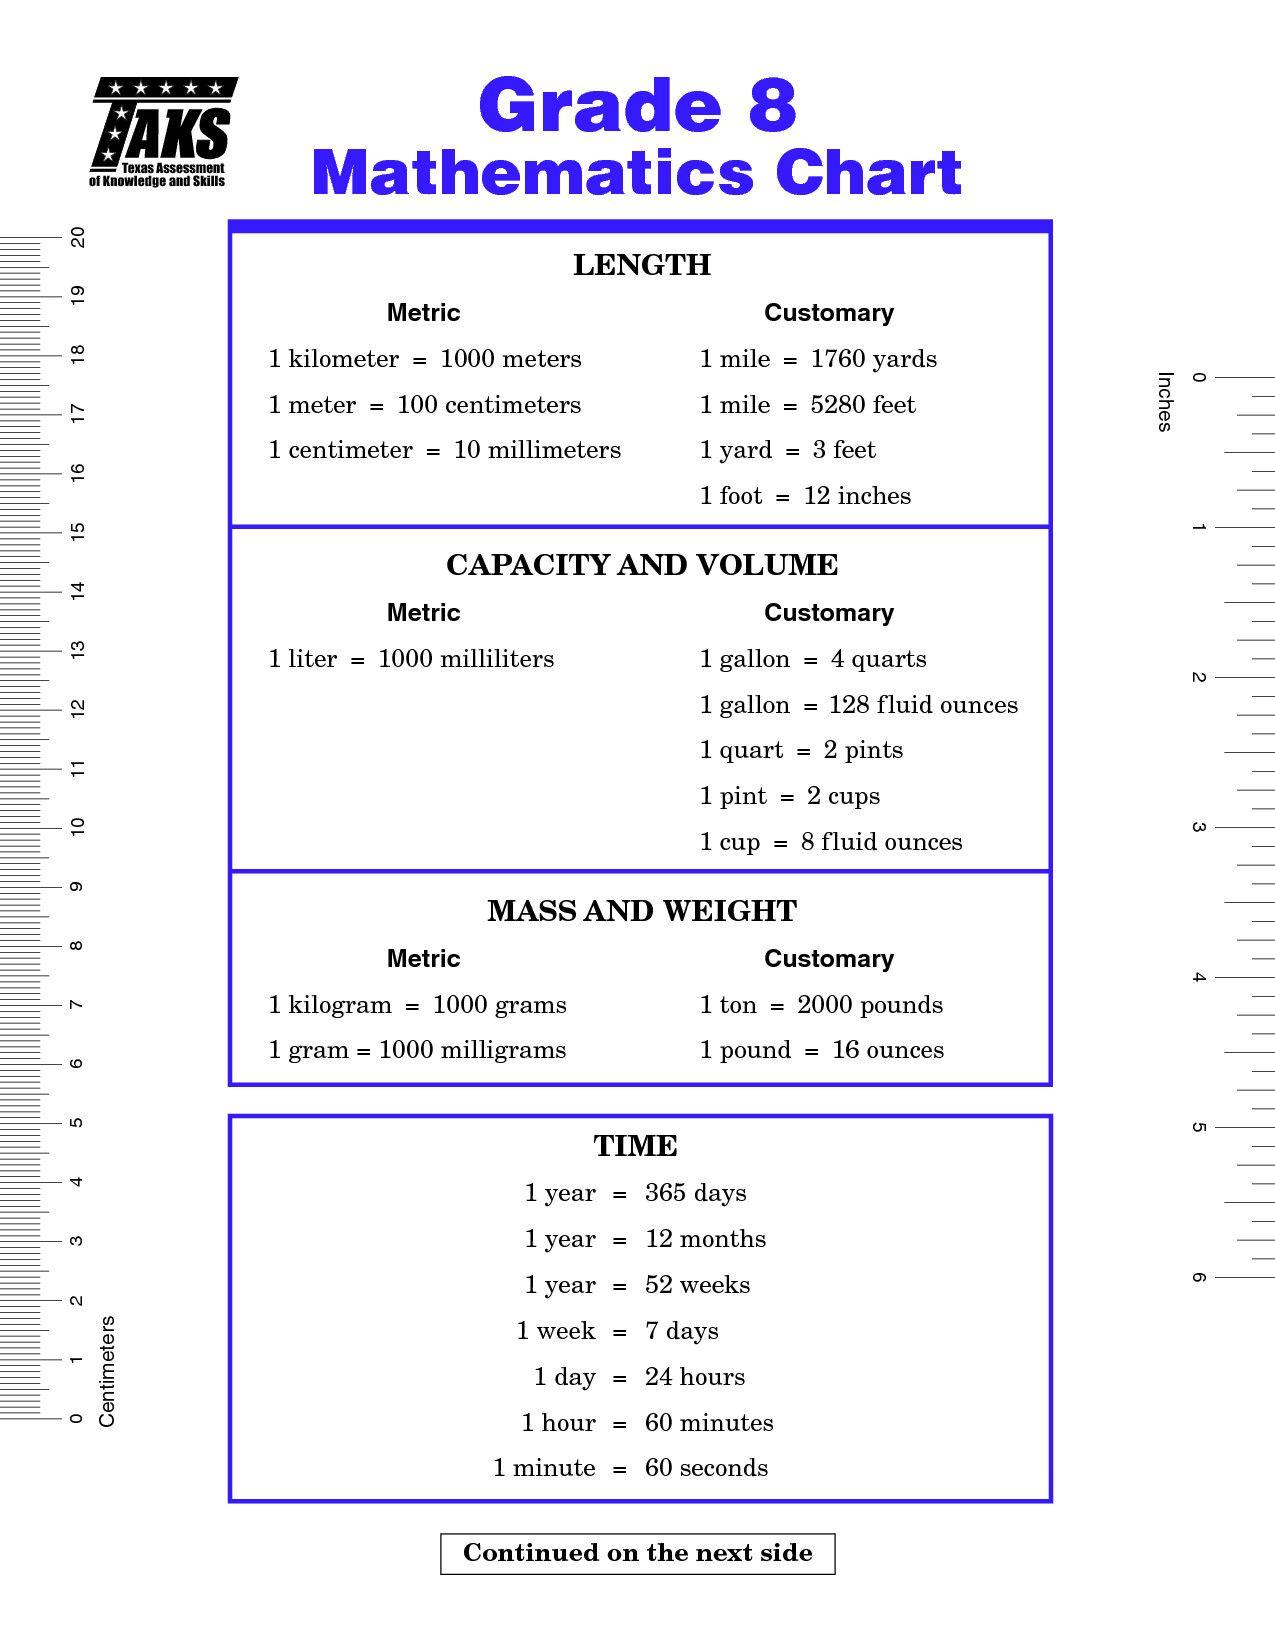 medium resolution of 5 Free Math Worksheets Second Grade 2 Measurement Metric Units Mass Kg Gm 8  8th g…   2nd grade math worksheets